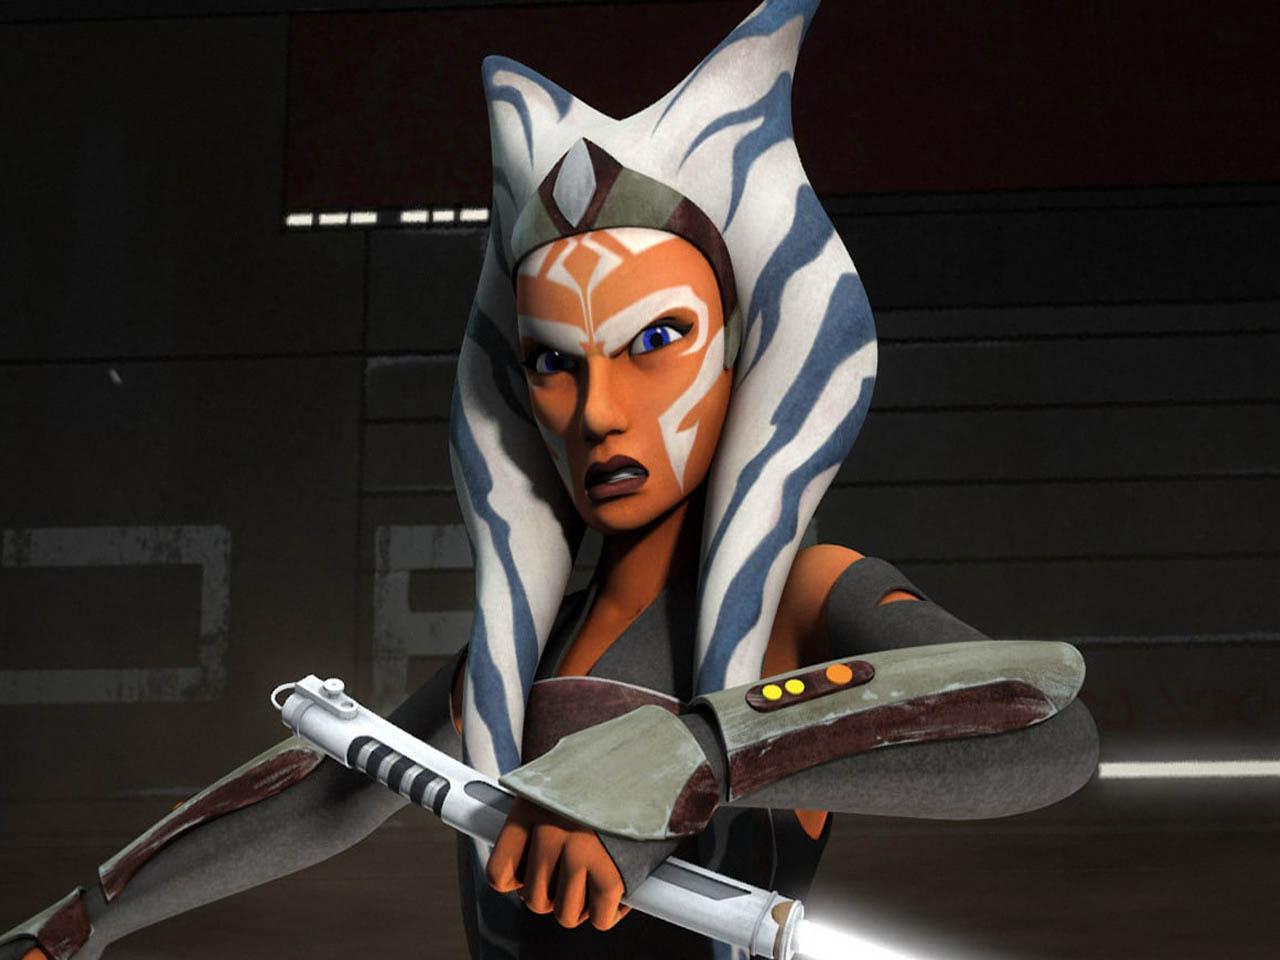 Star Wars - Ahsoka Tano - Rebels - 1280 - Featured - 01